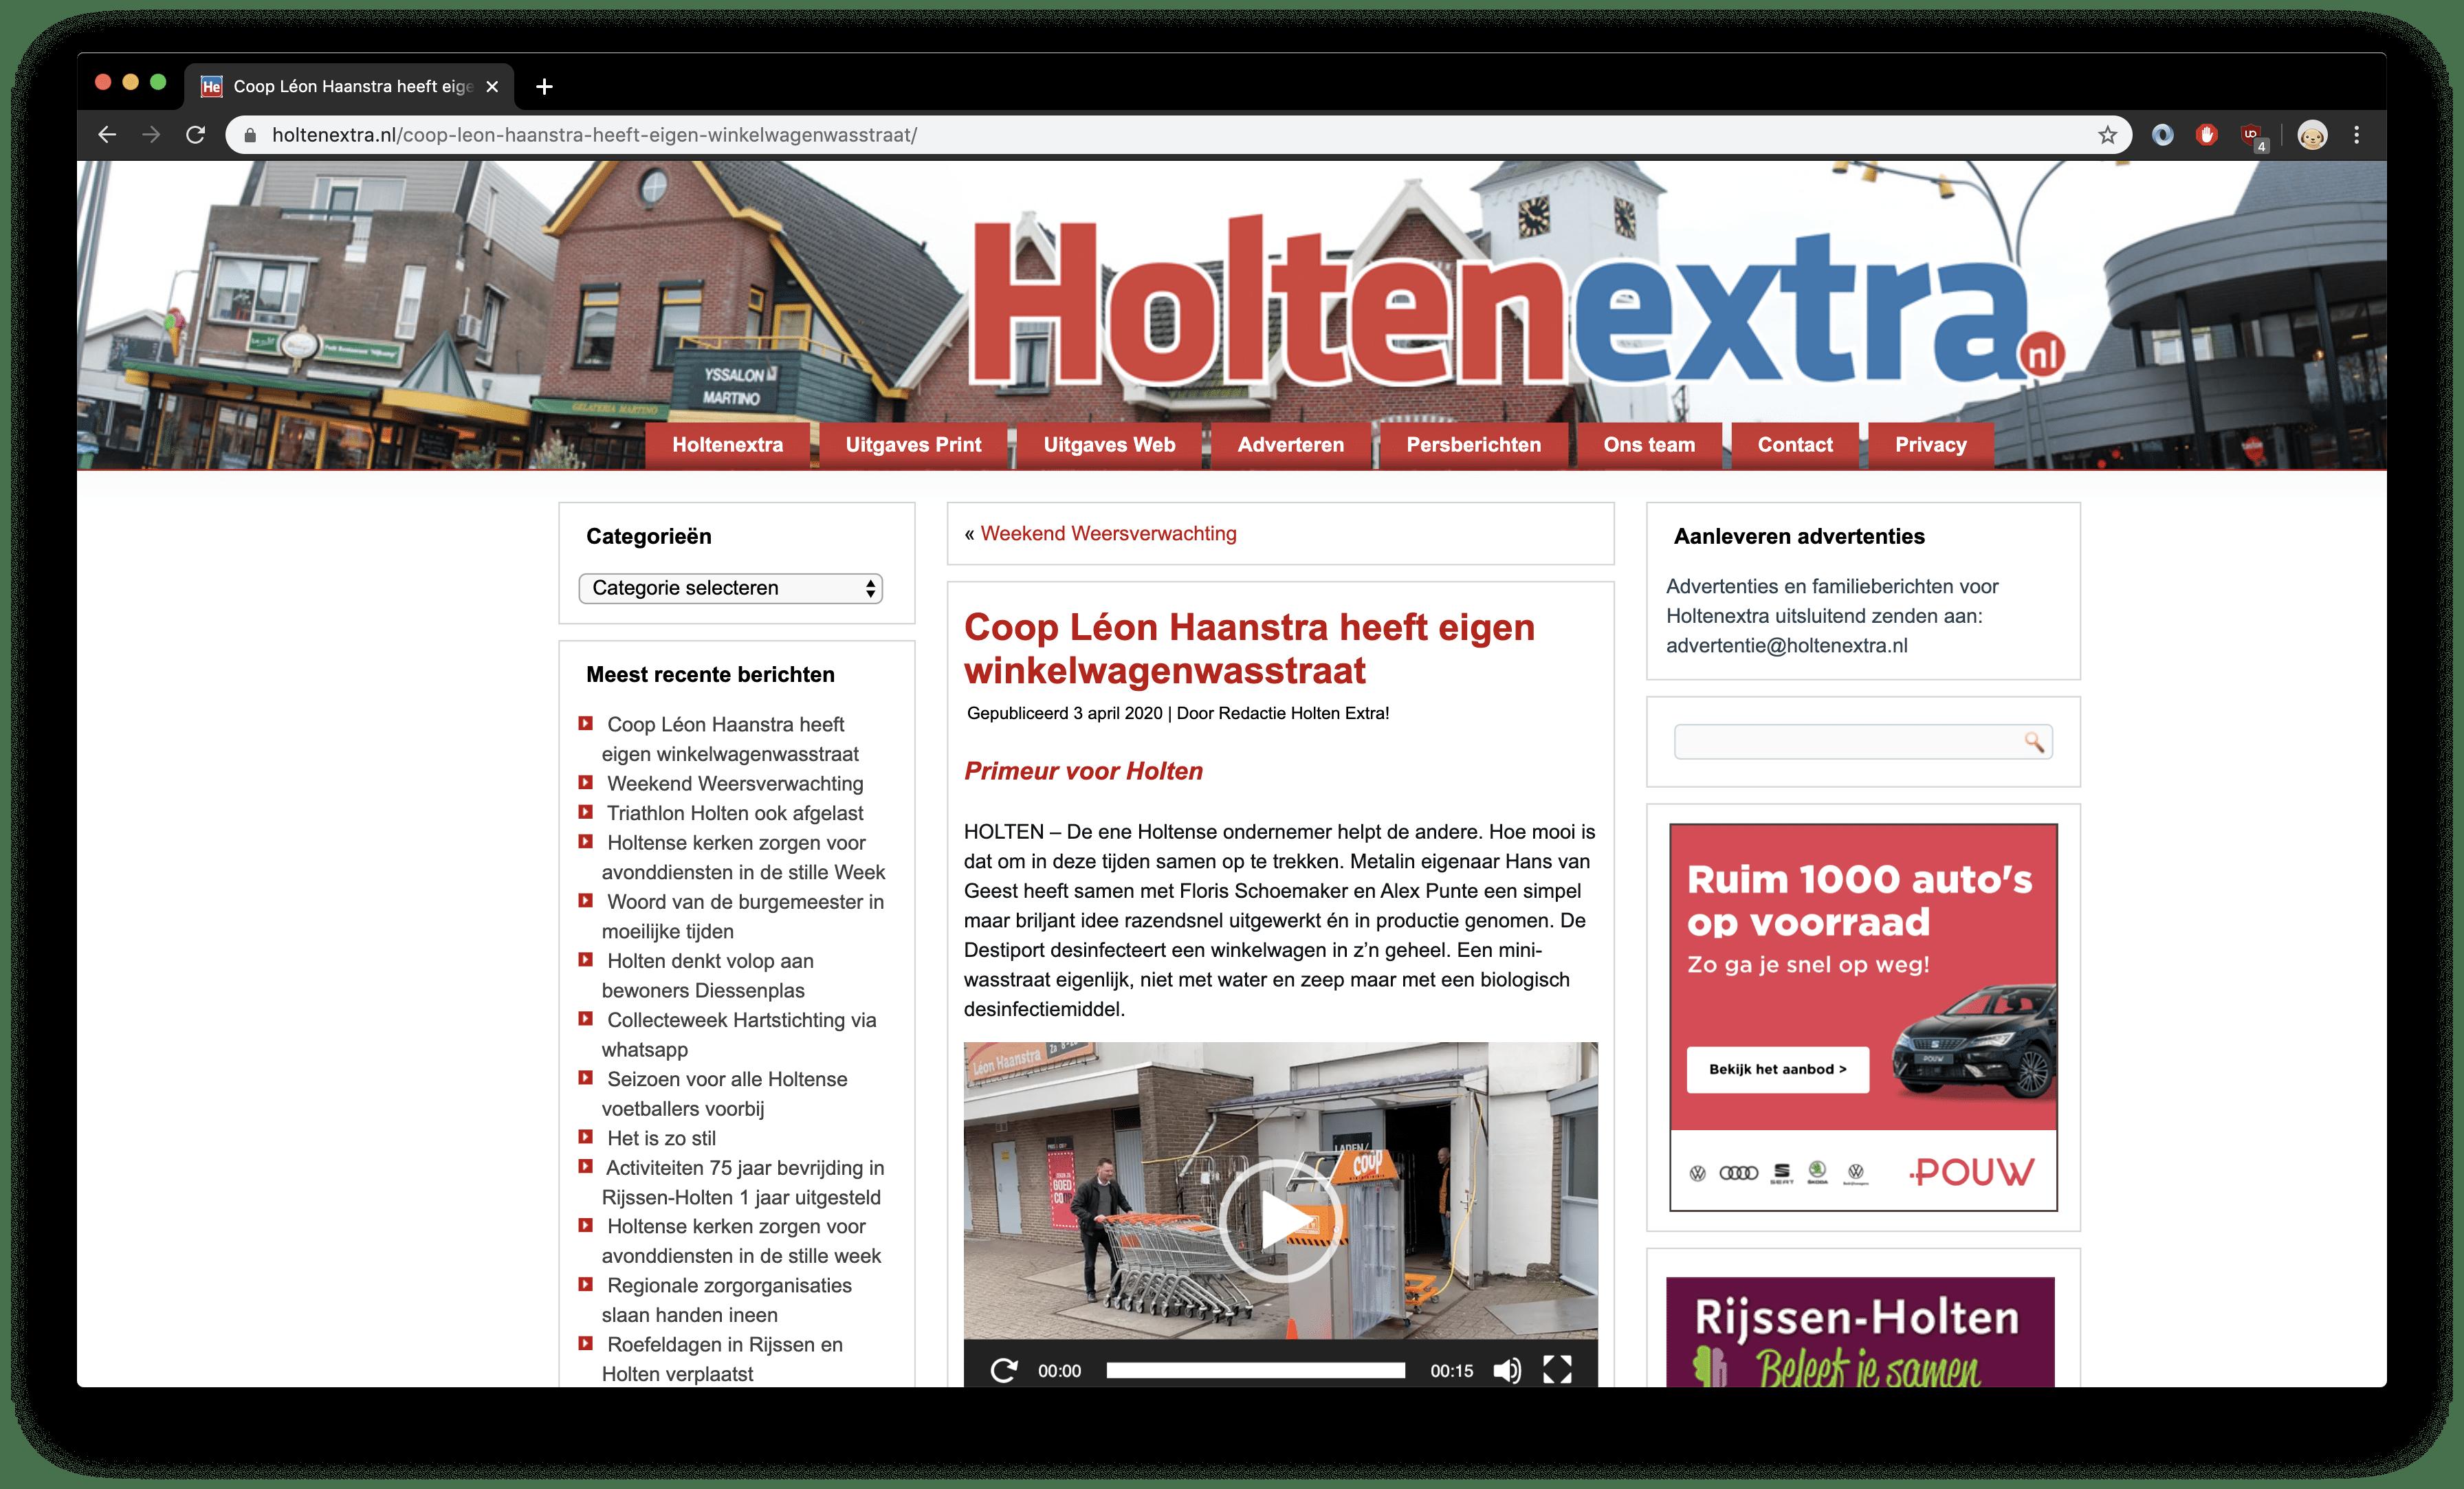 Holtenextra